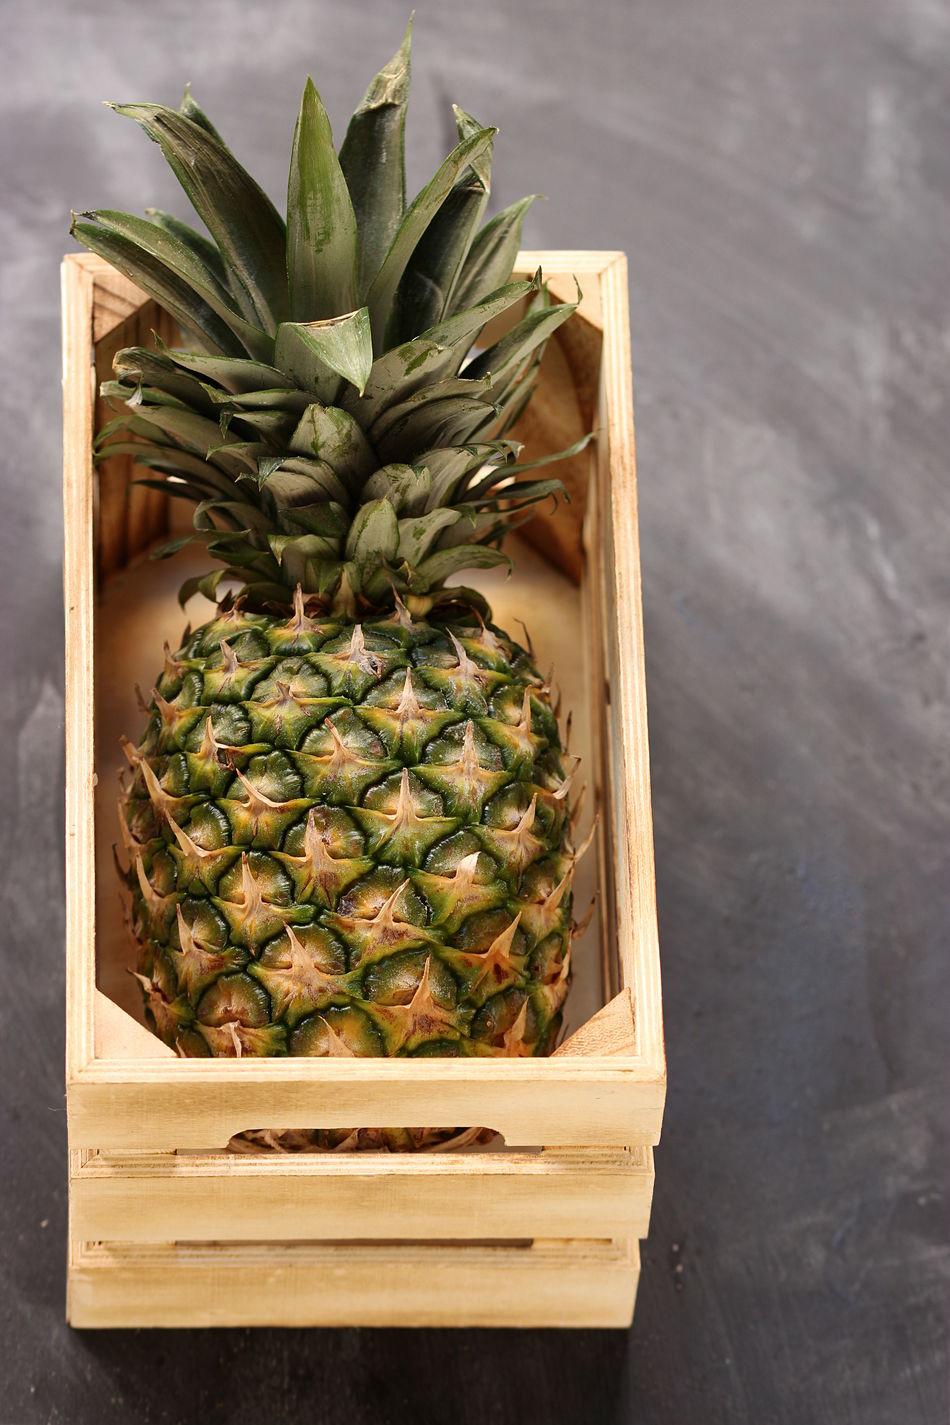 Ananas Exotic Fruit Exotic Fruits Food Freshness Fruit Fruits Healthy Eating Nature Pineapple